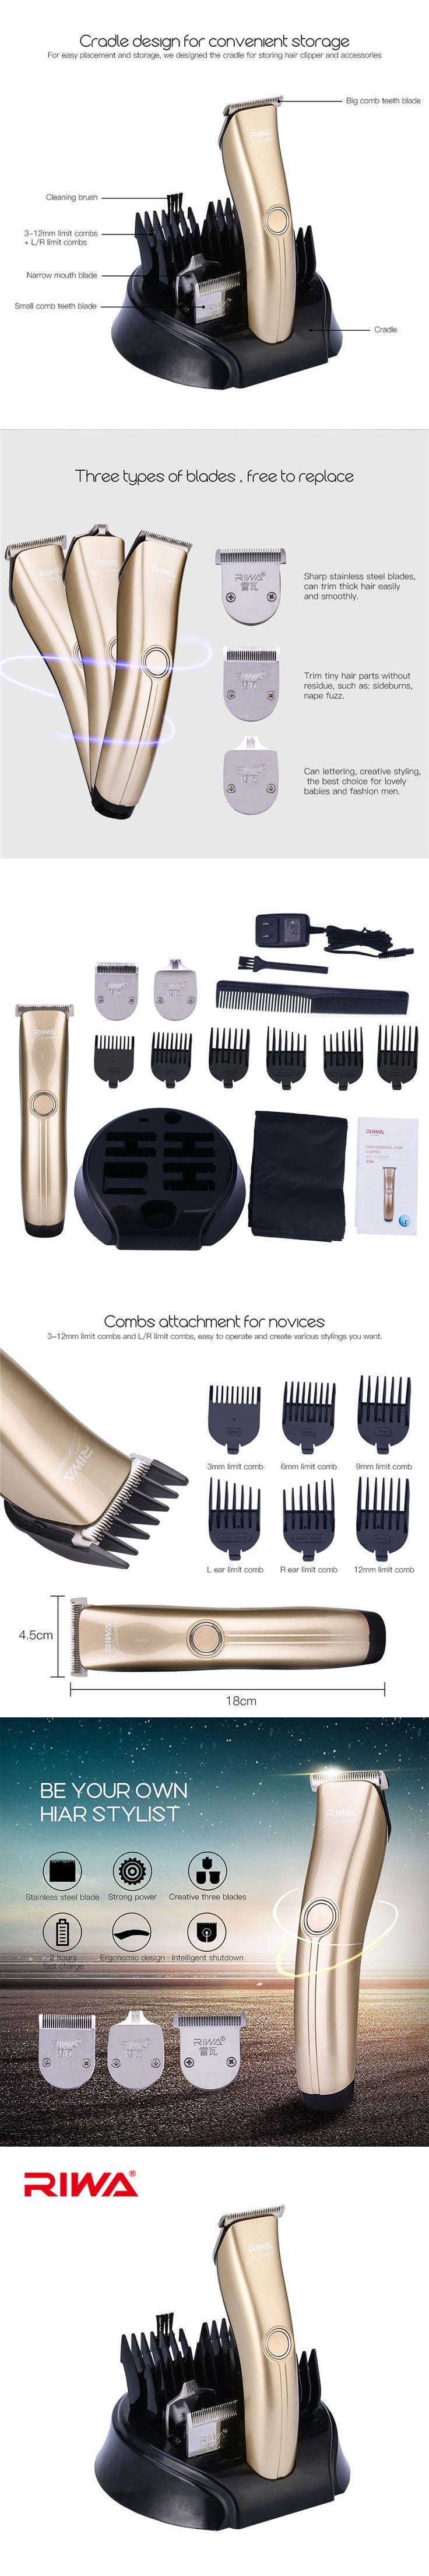 RIWA Clipper Professional Hair Cutting Electric Hair Trimmer Rechargeable Shaver Beard Trimmer Clipper Men Hair Clipper Machine